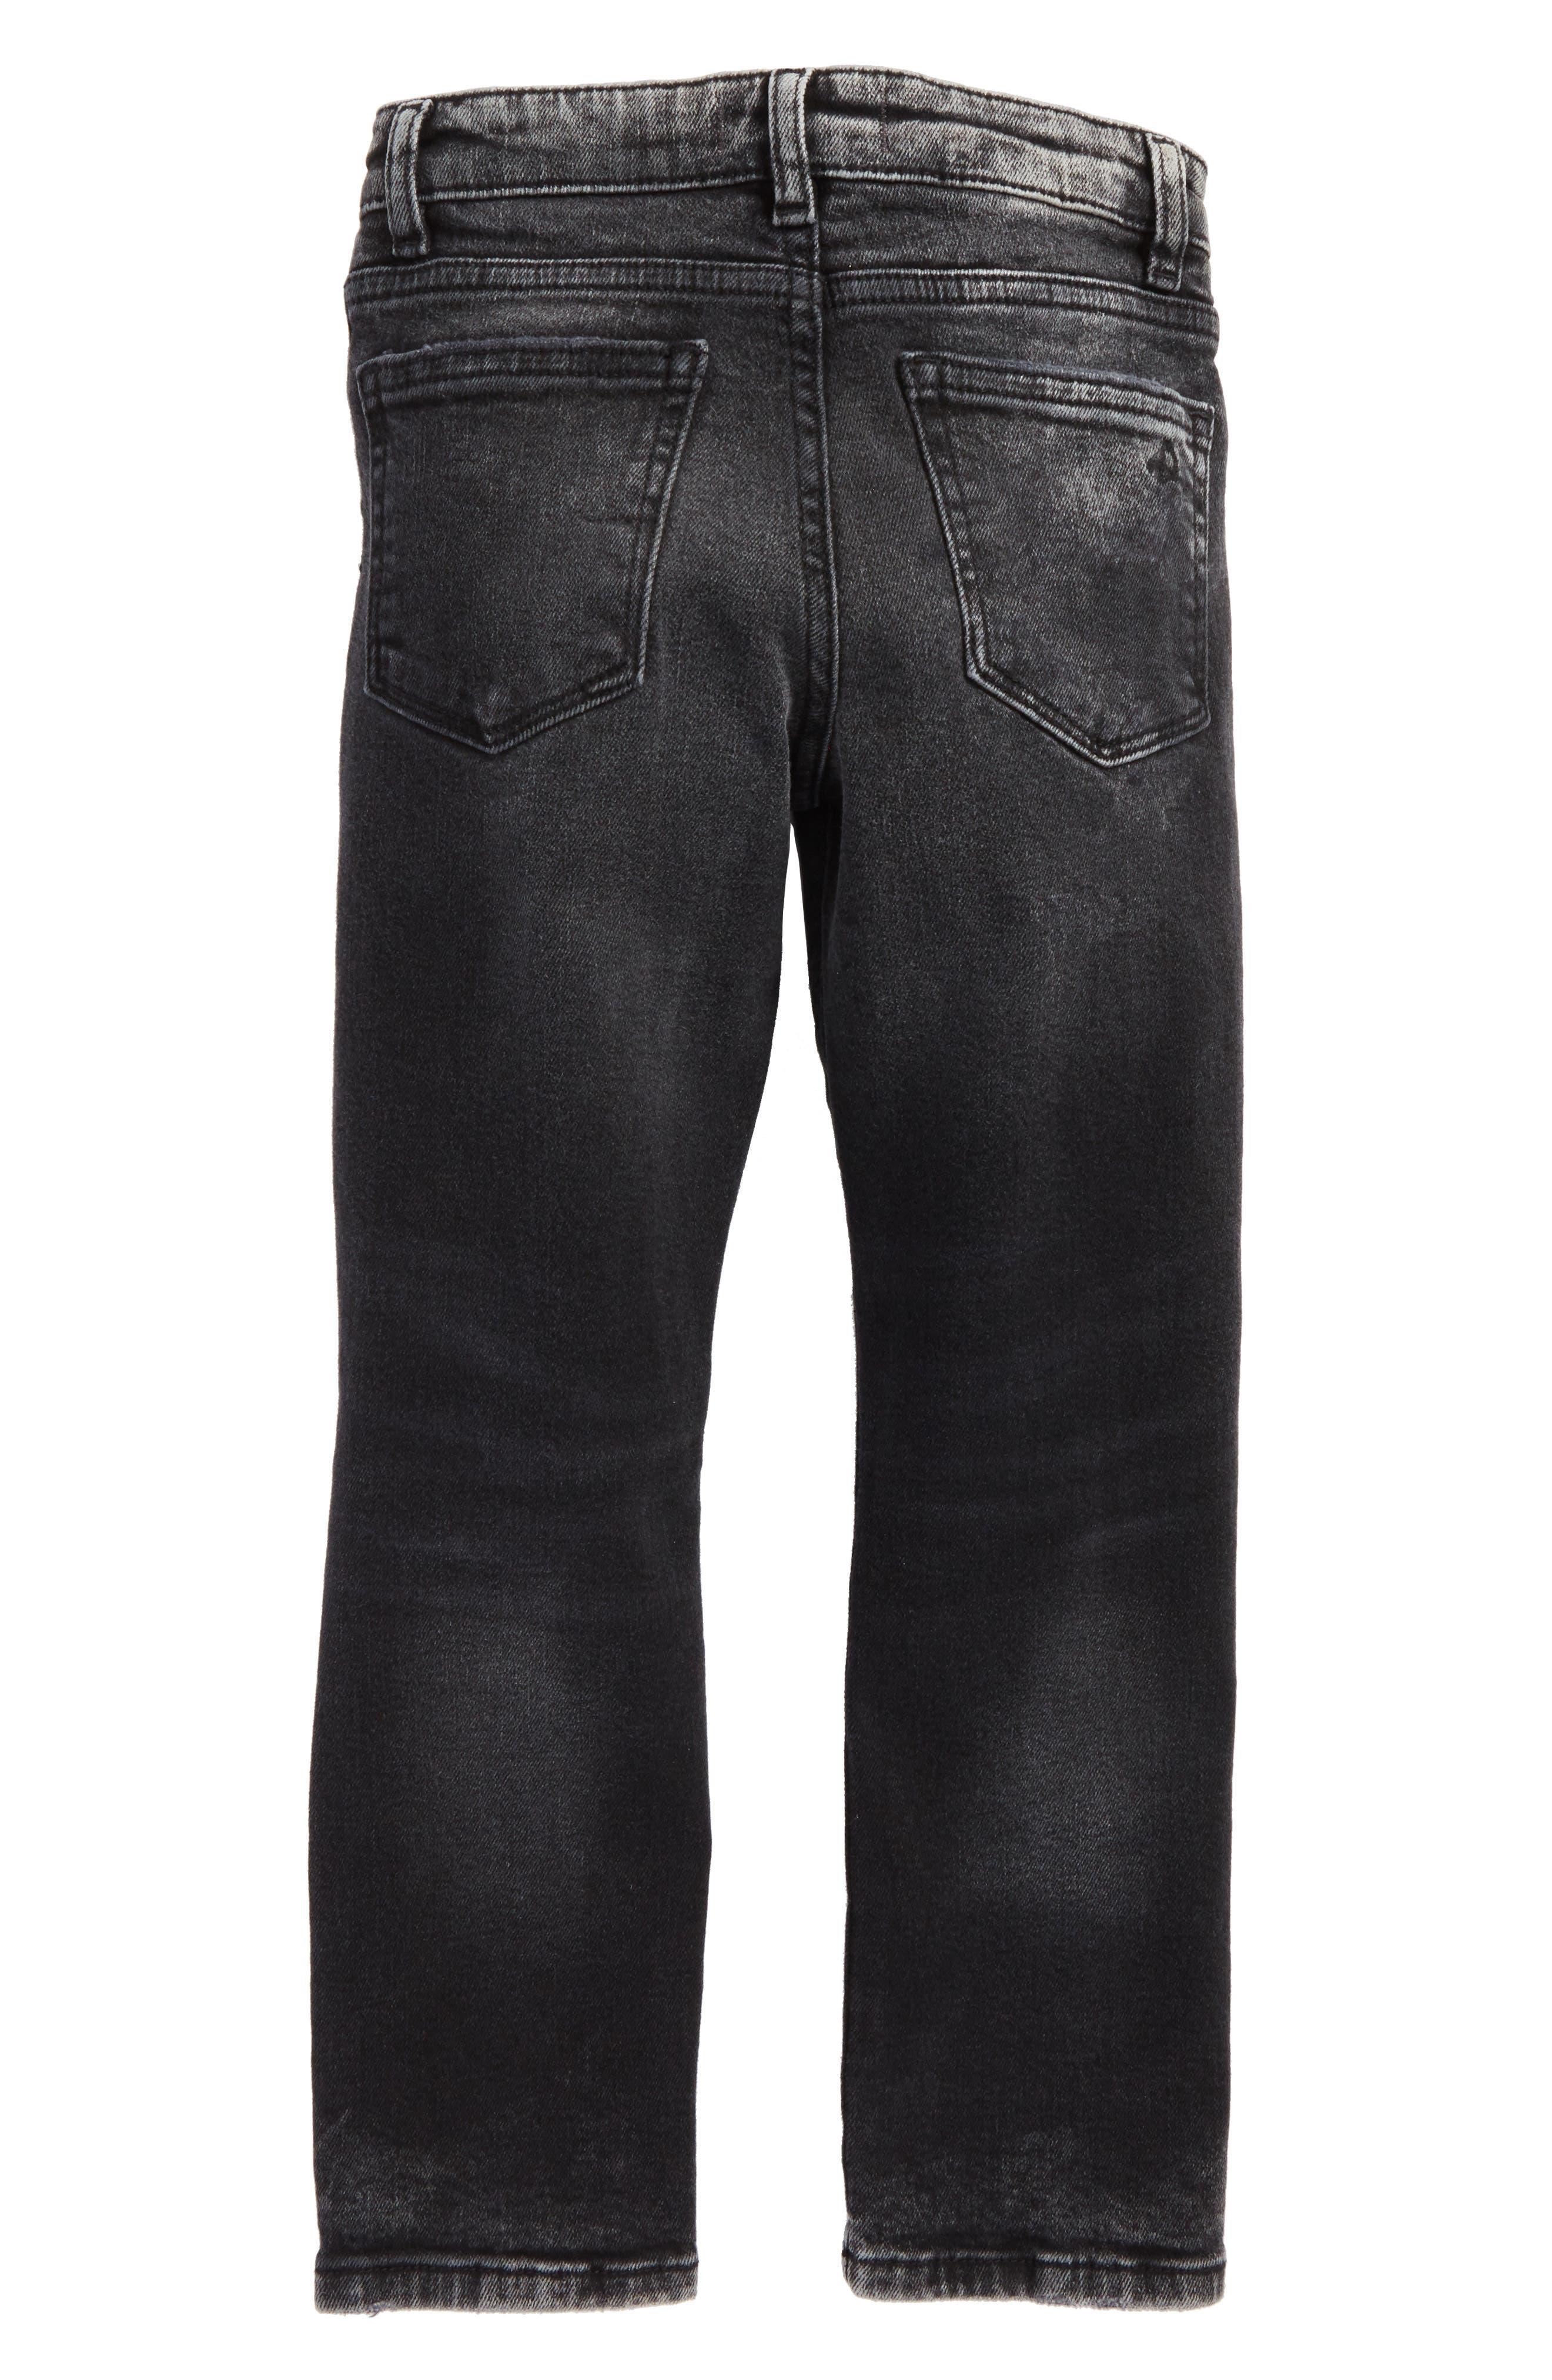 Hawke Skinny Jeans,                             Alternate thumbnail 2, color,